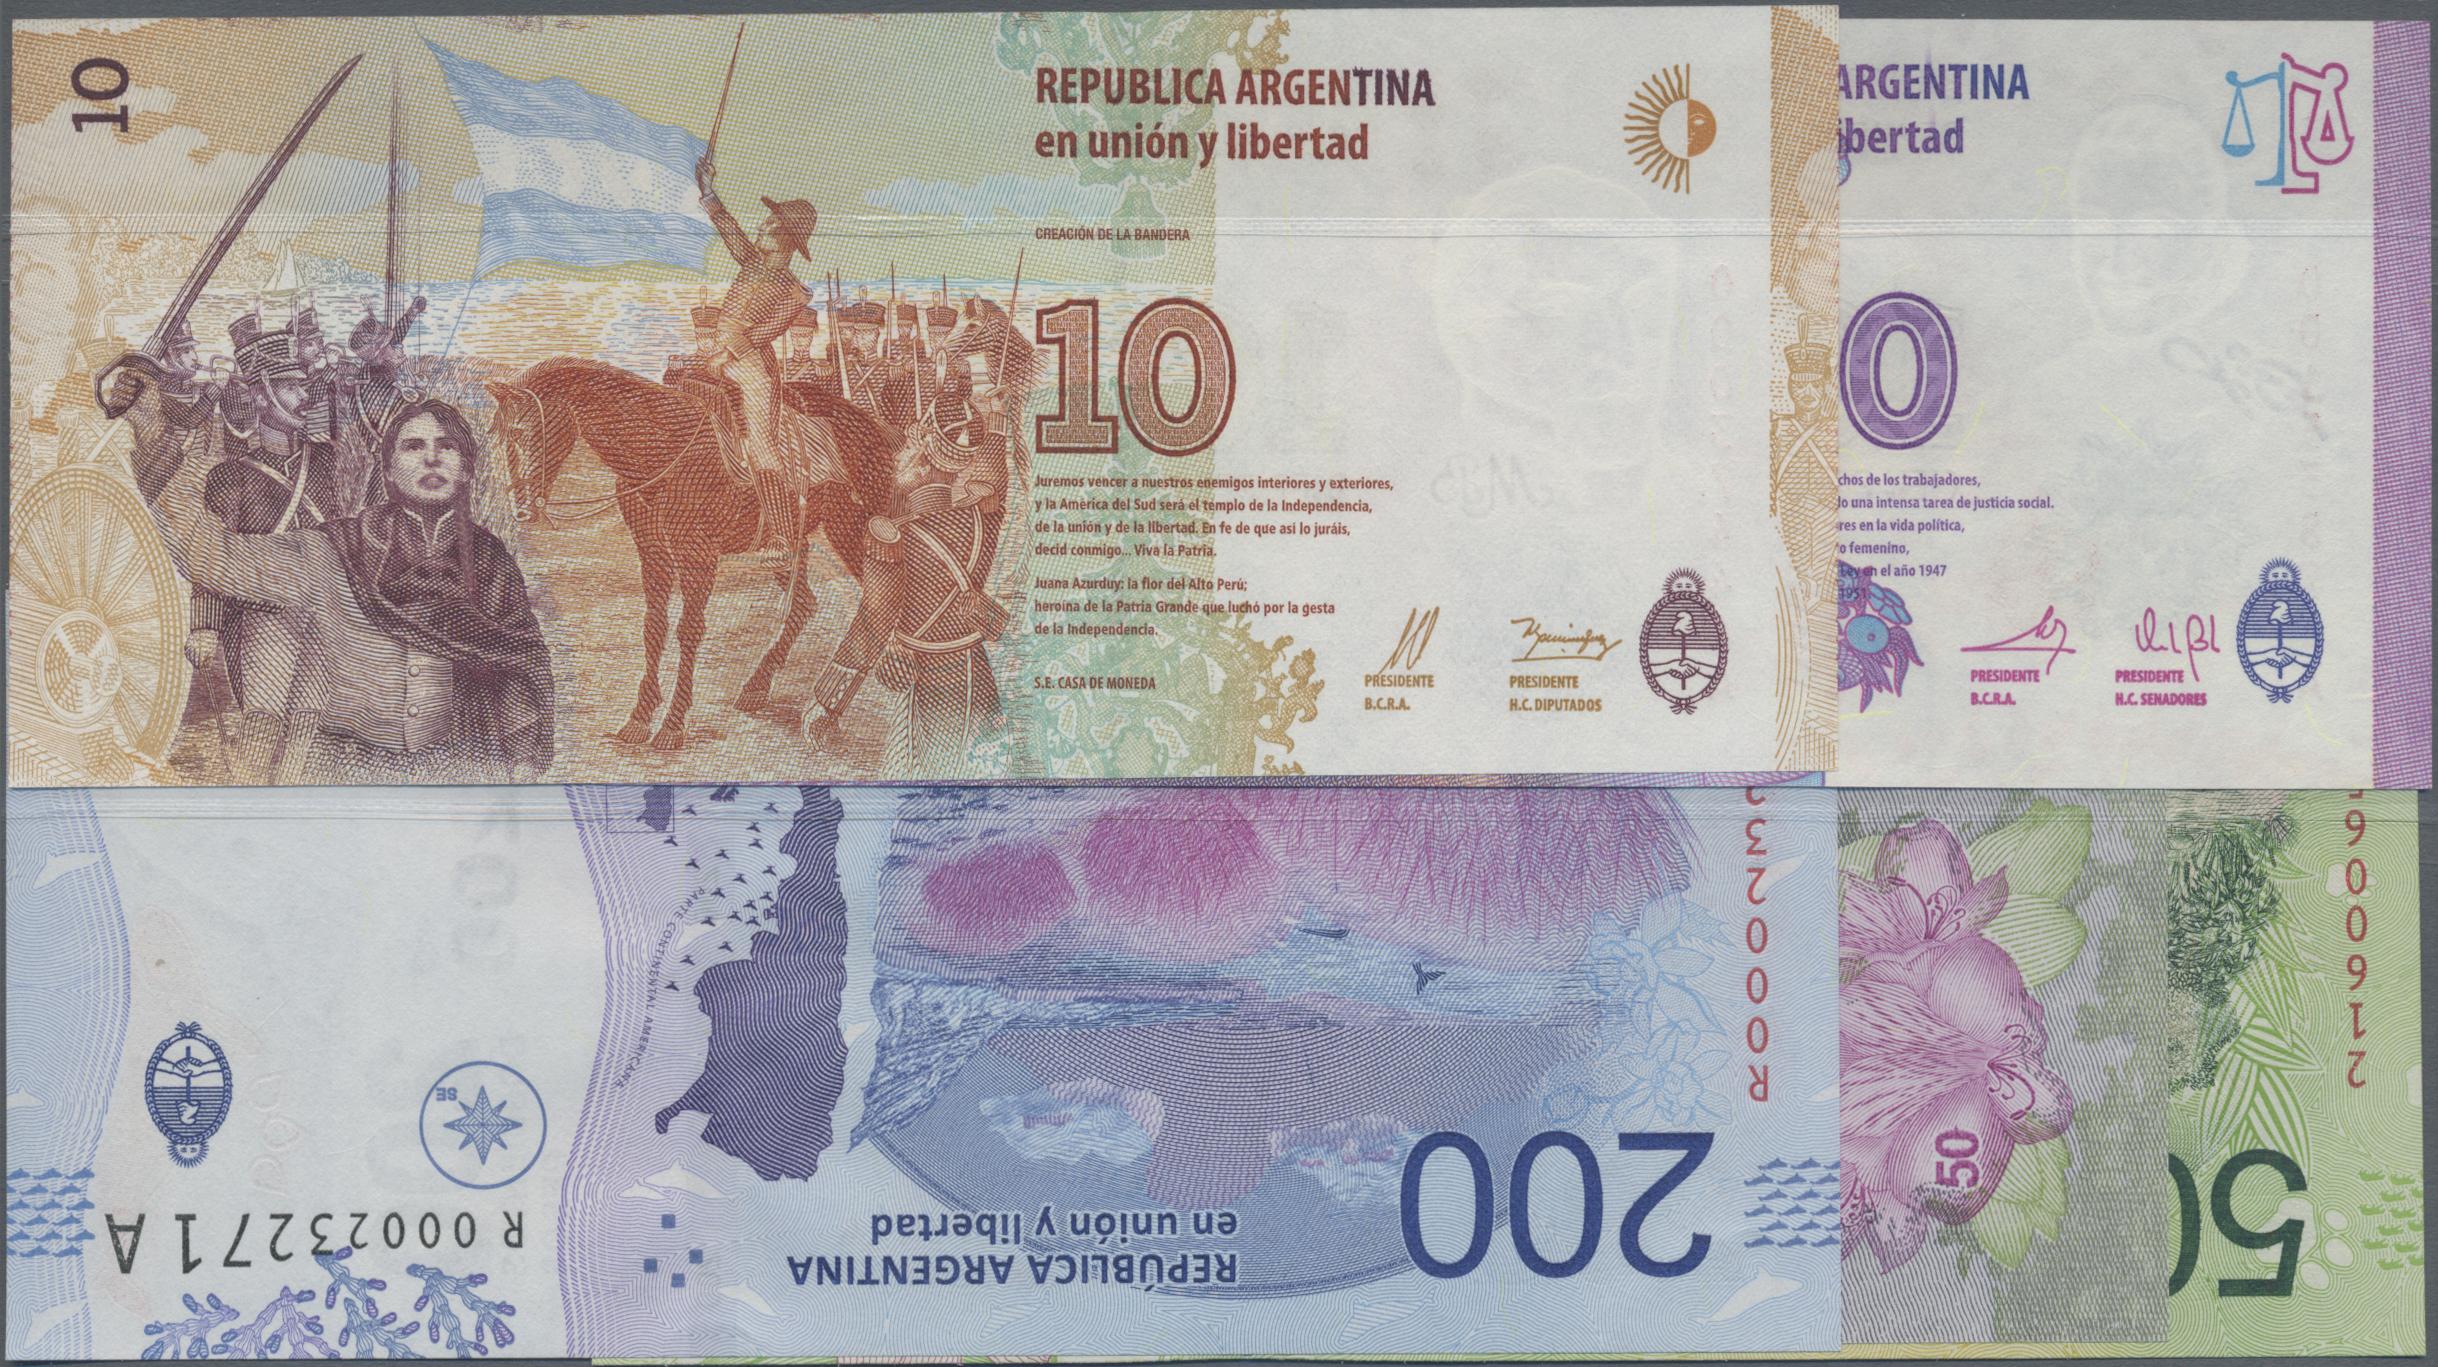 Lot 00013 - Argentina / Argentinien | Banknoten  -  Auktionshaus Christoph Gärtner GmbH & Co. KG 51th Auction - Day 1